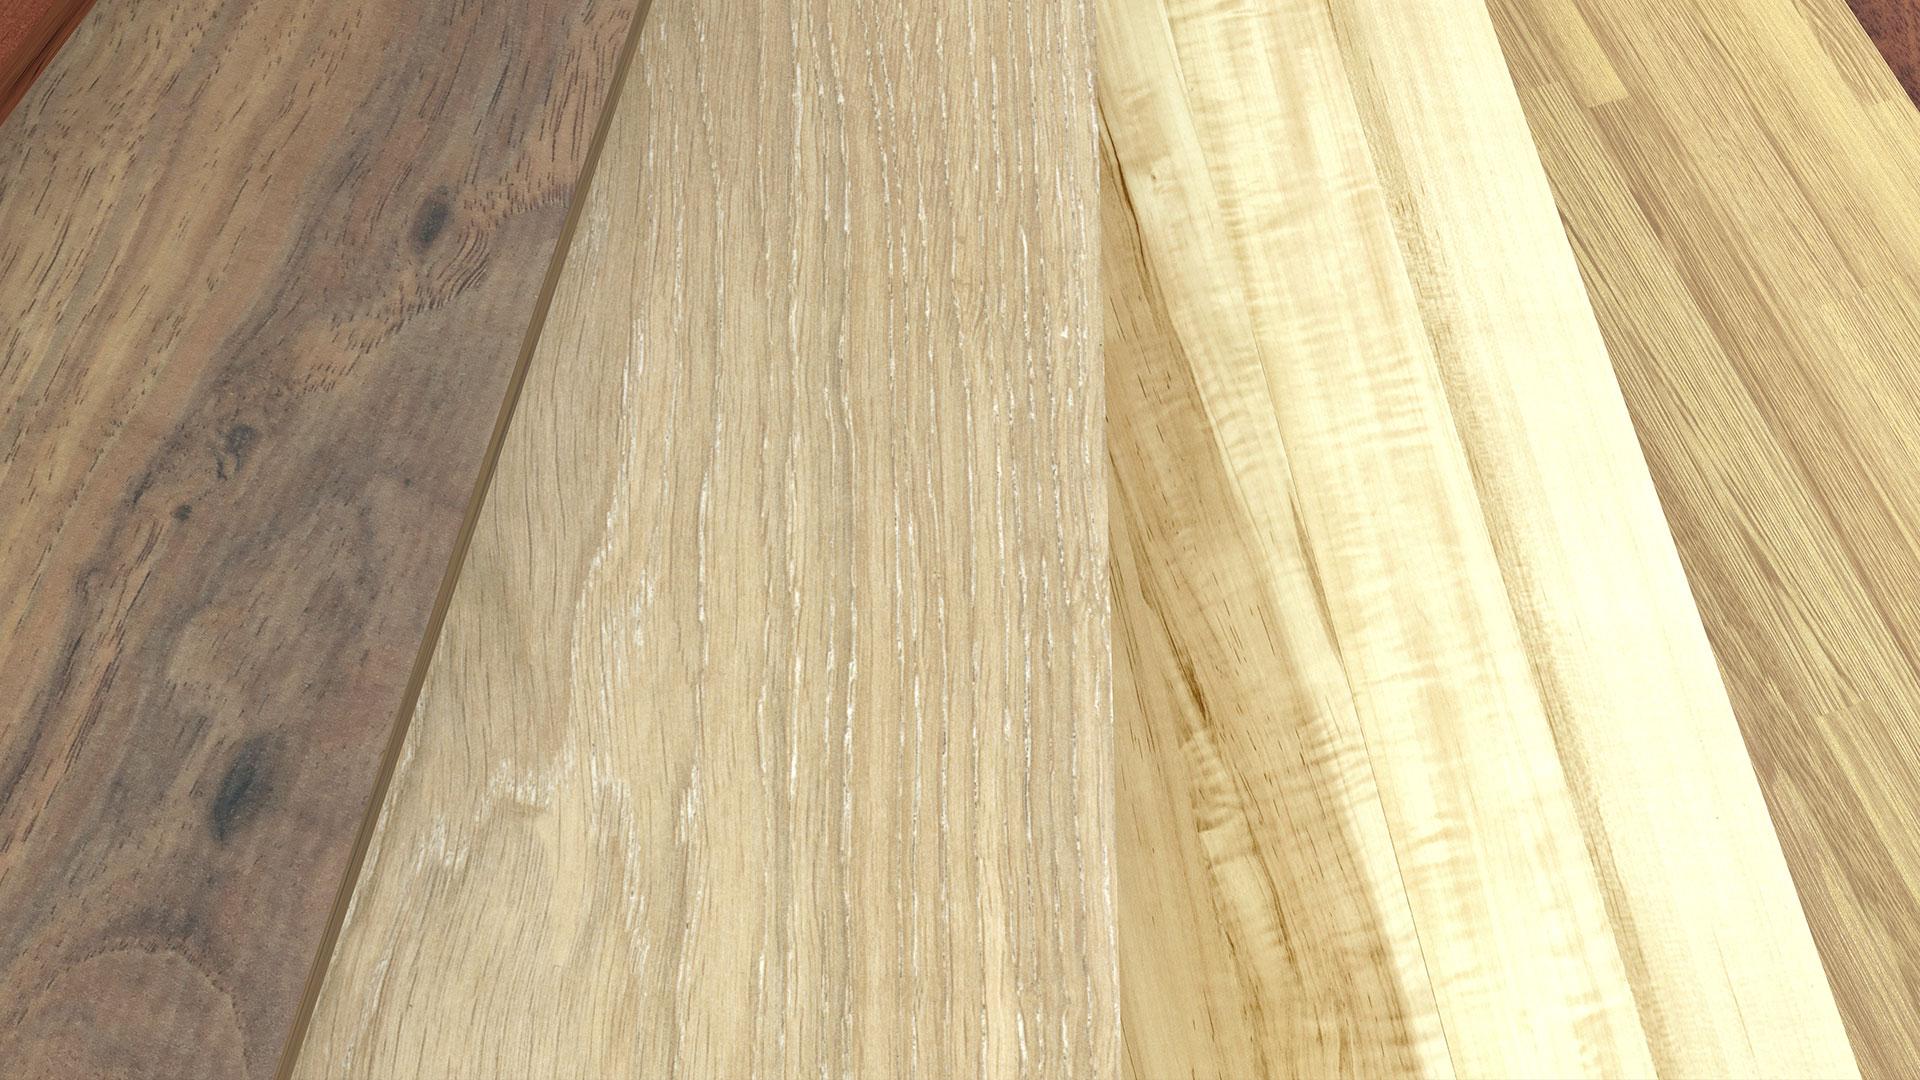 Hardwood flooring louisville ky floor matttroy for Hardwood flooring 40245